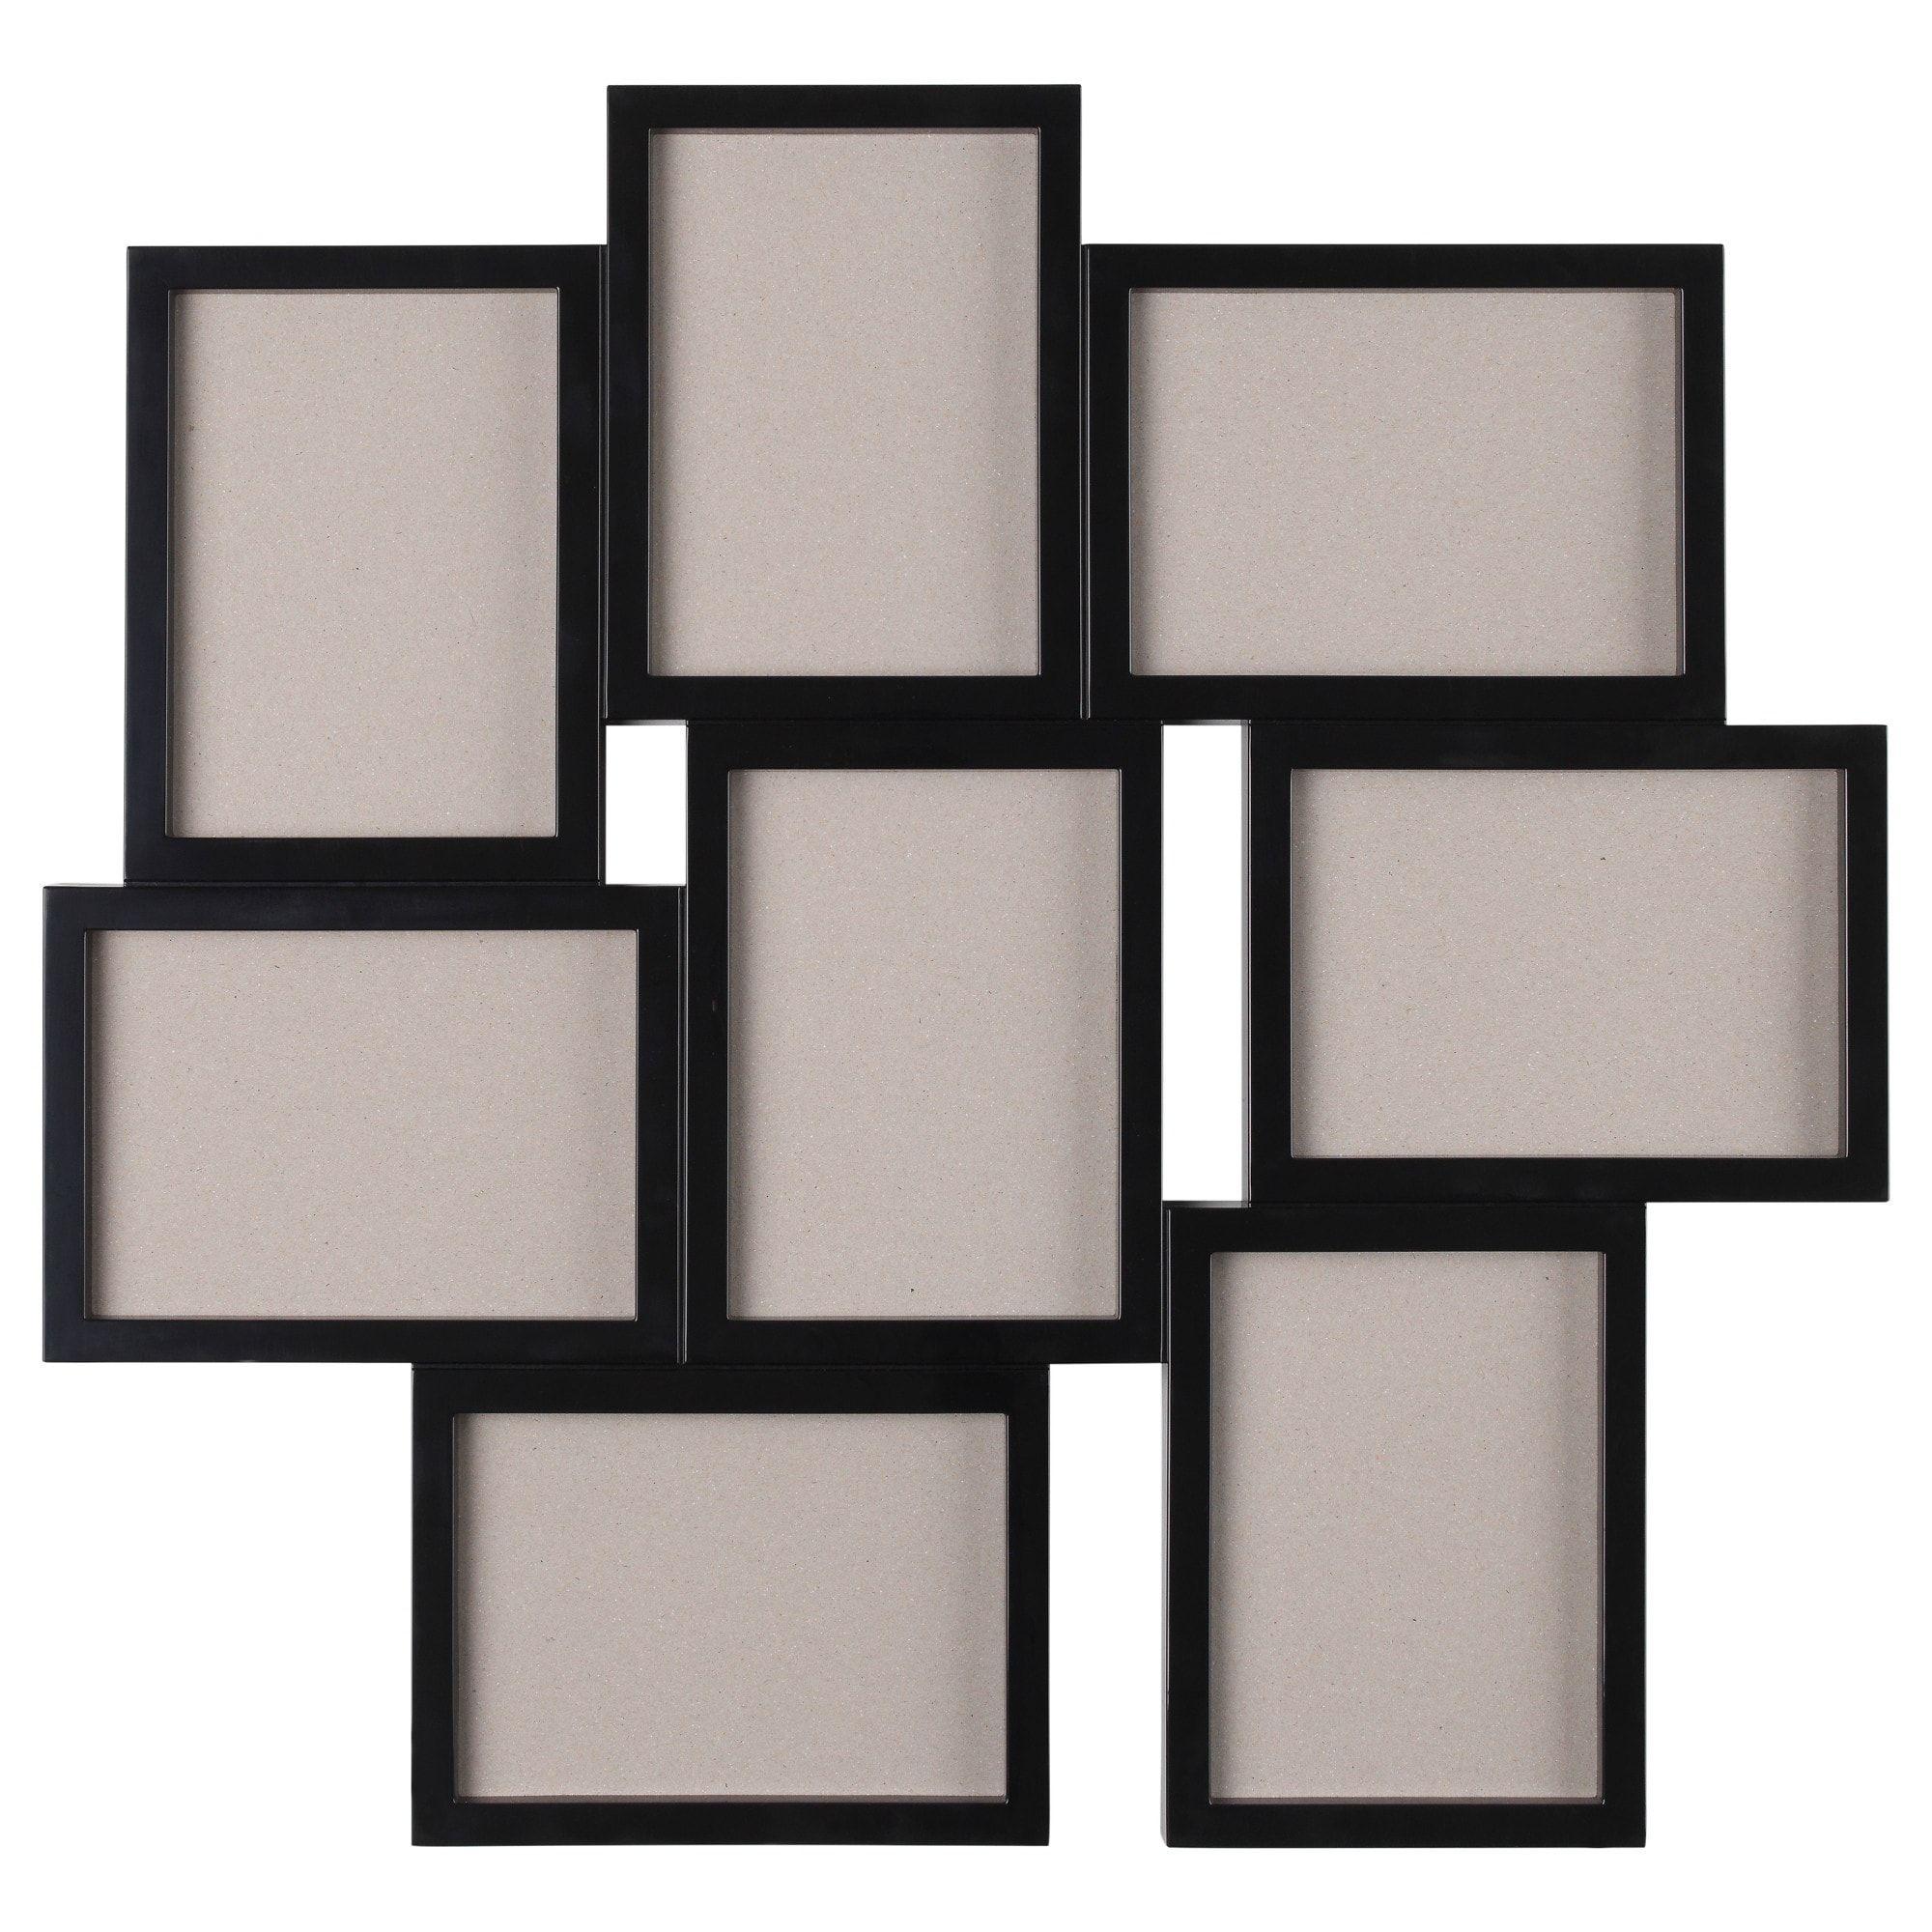 "VÄXBO Collage frame for 8 photos black 5x7 "" (13x18 cm"